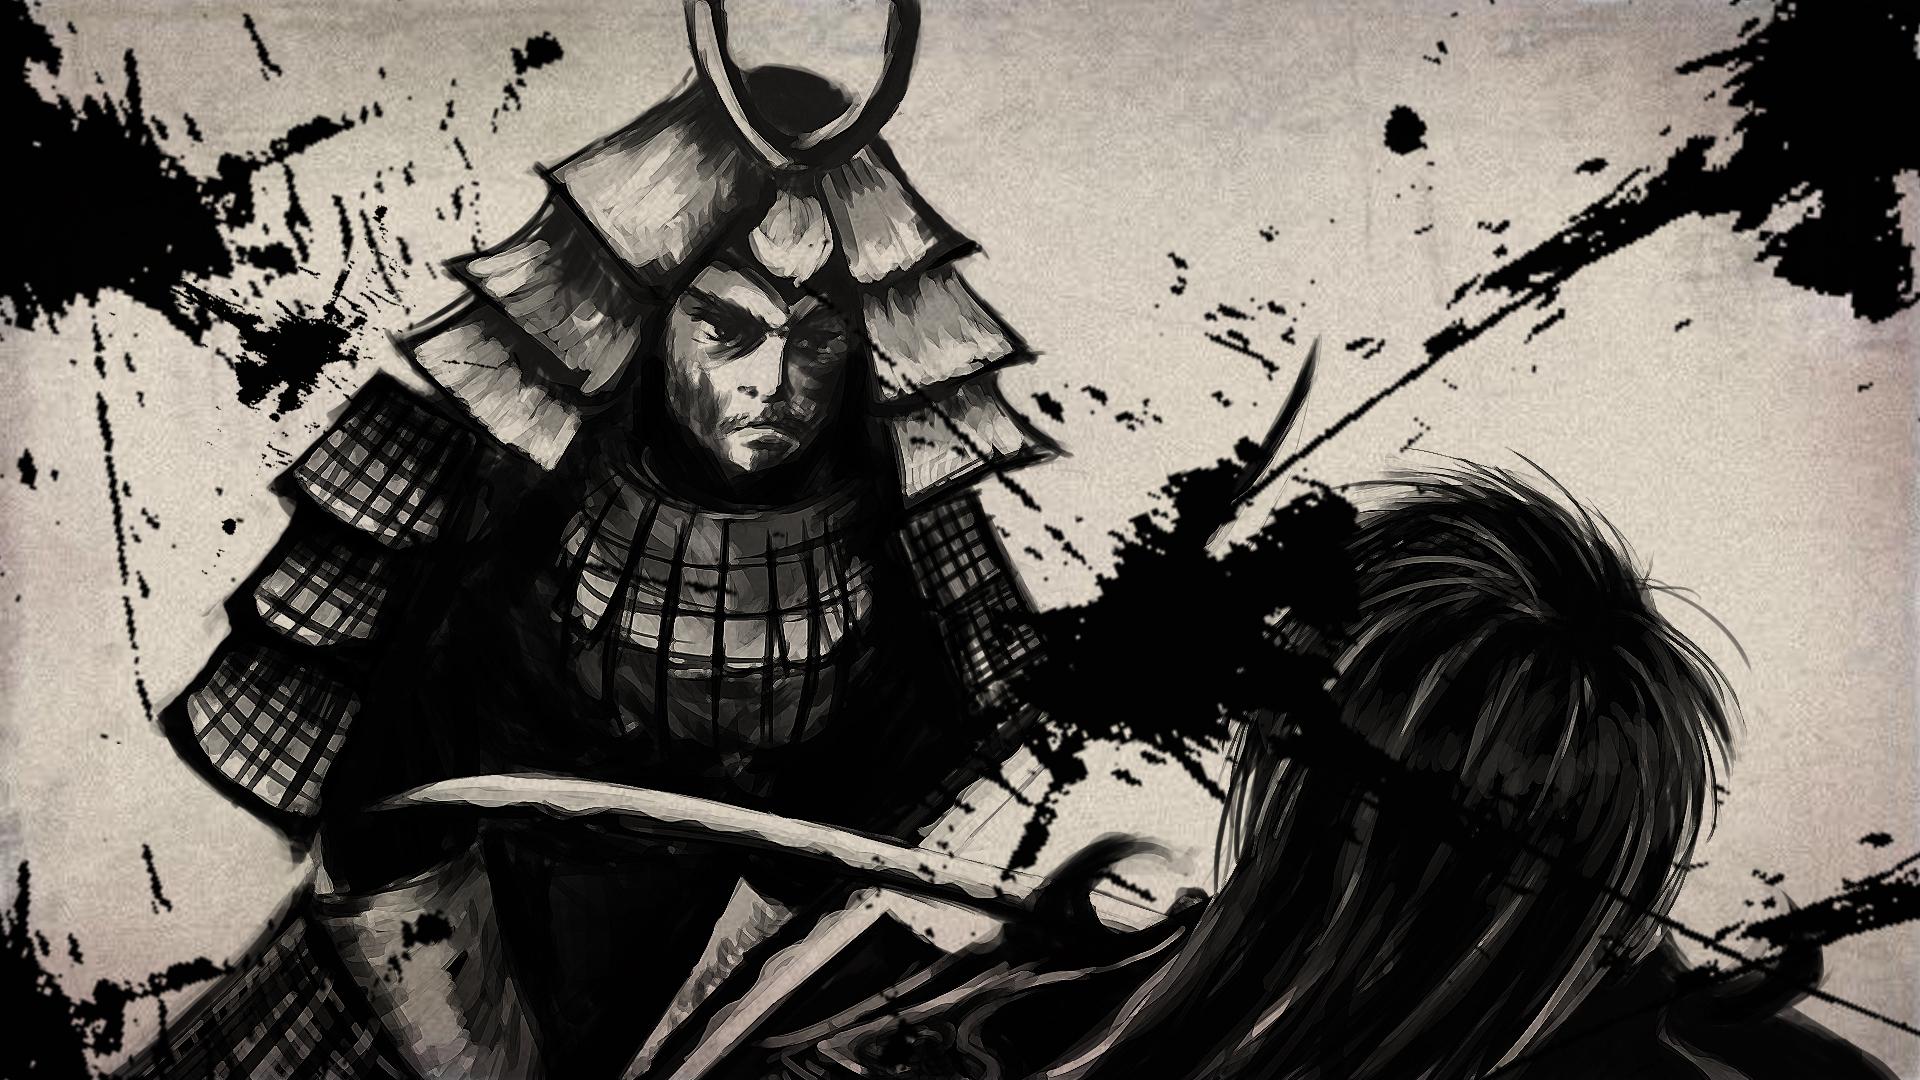 Samurai wallpaper   756888 1920x1080